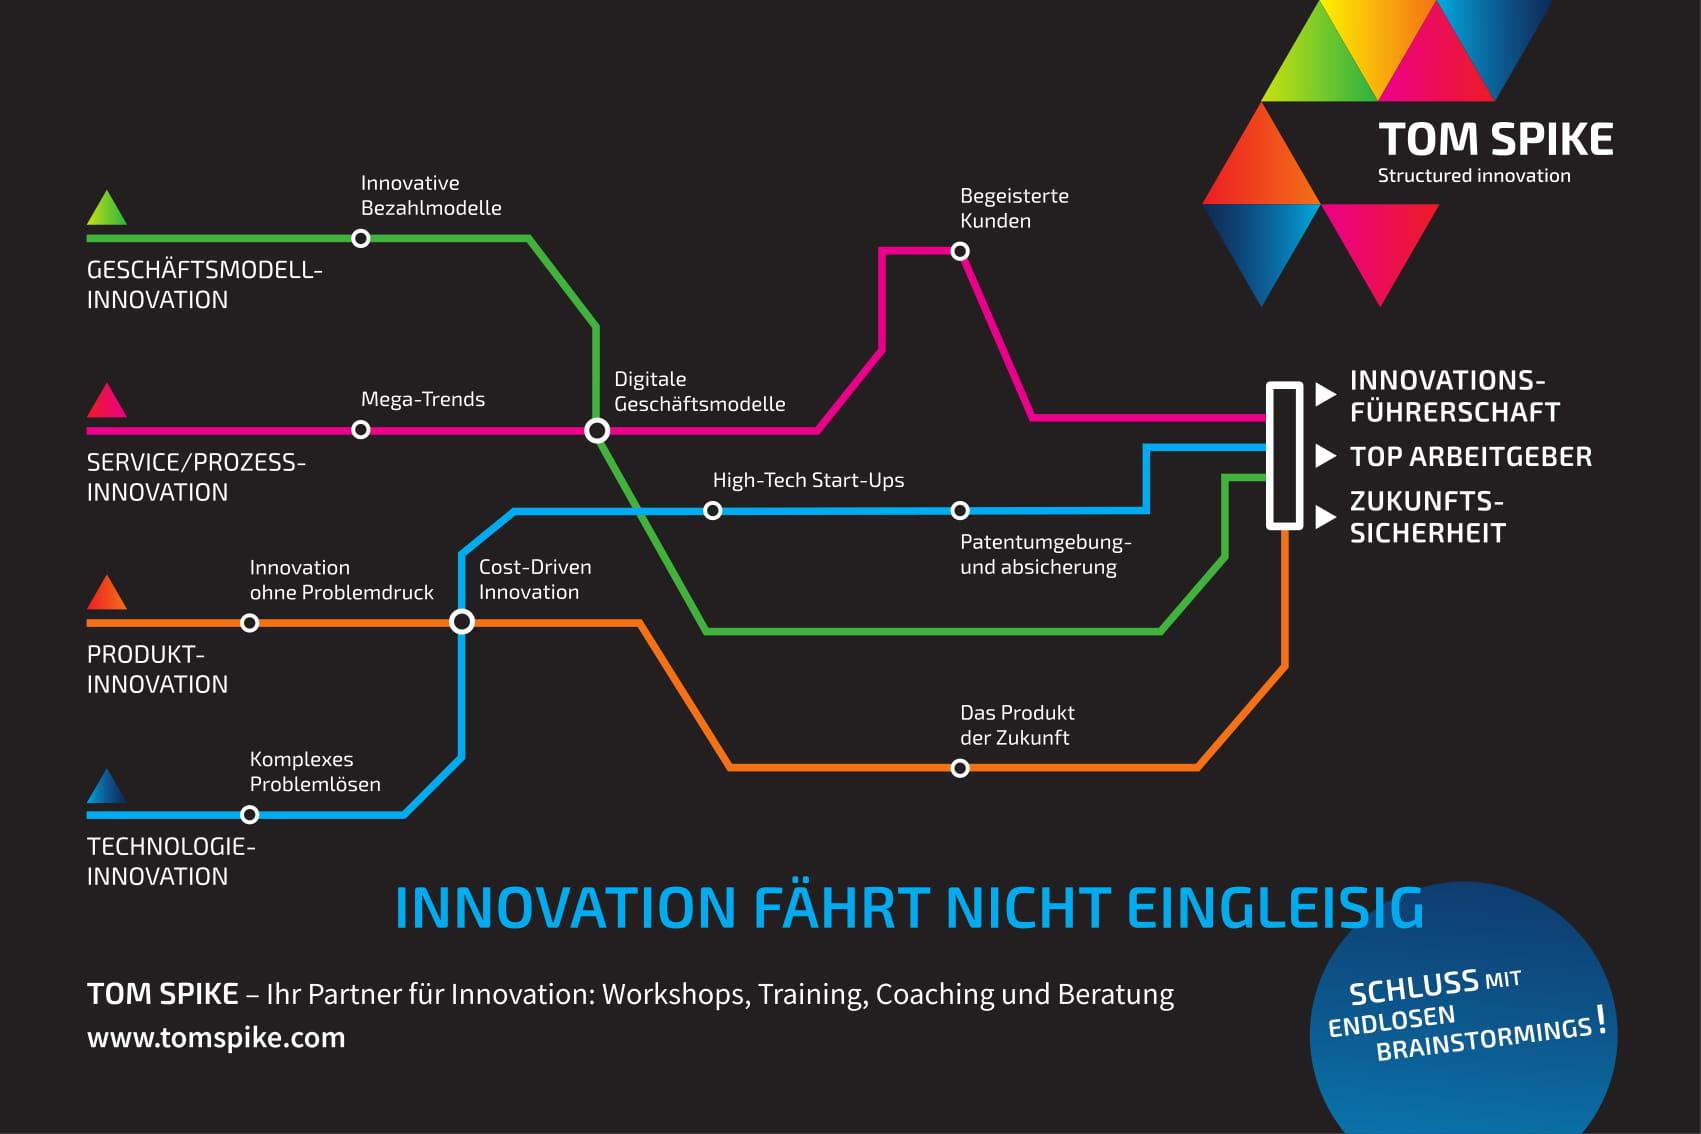 Endstation Brainstorming Innovationen Gehen Anders Tom Spike